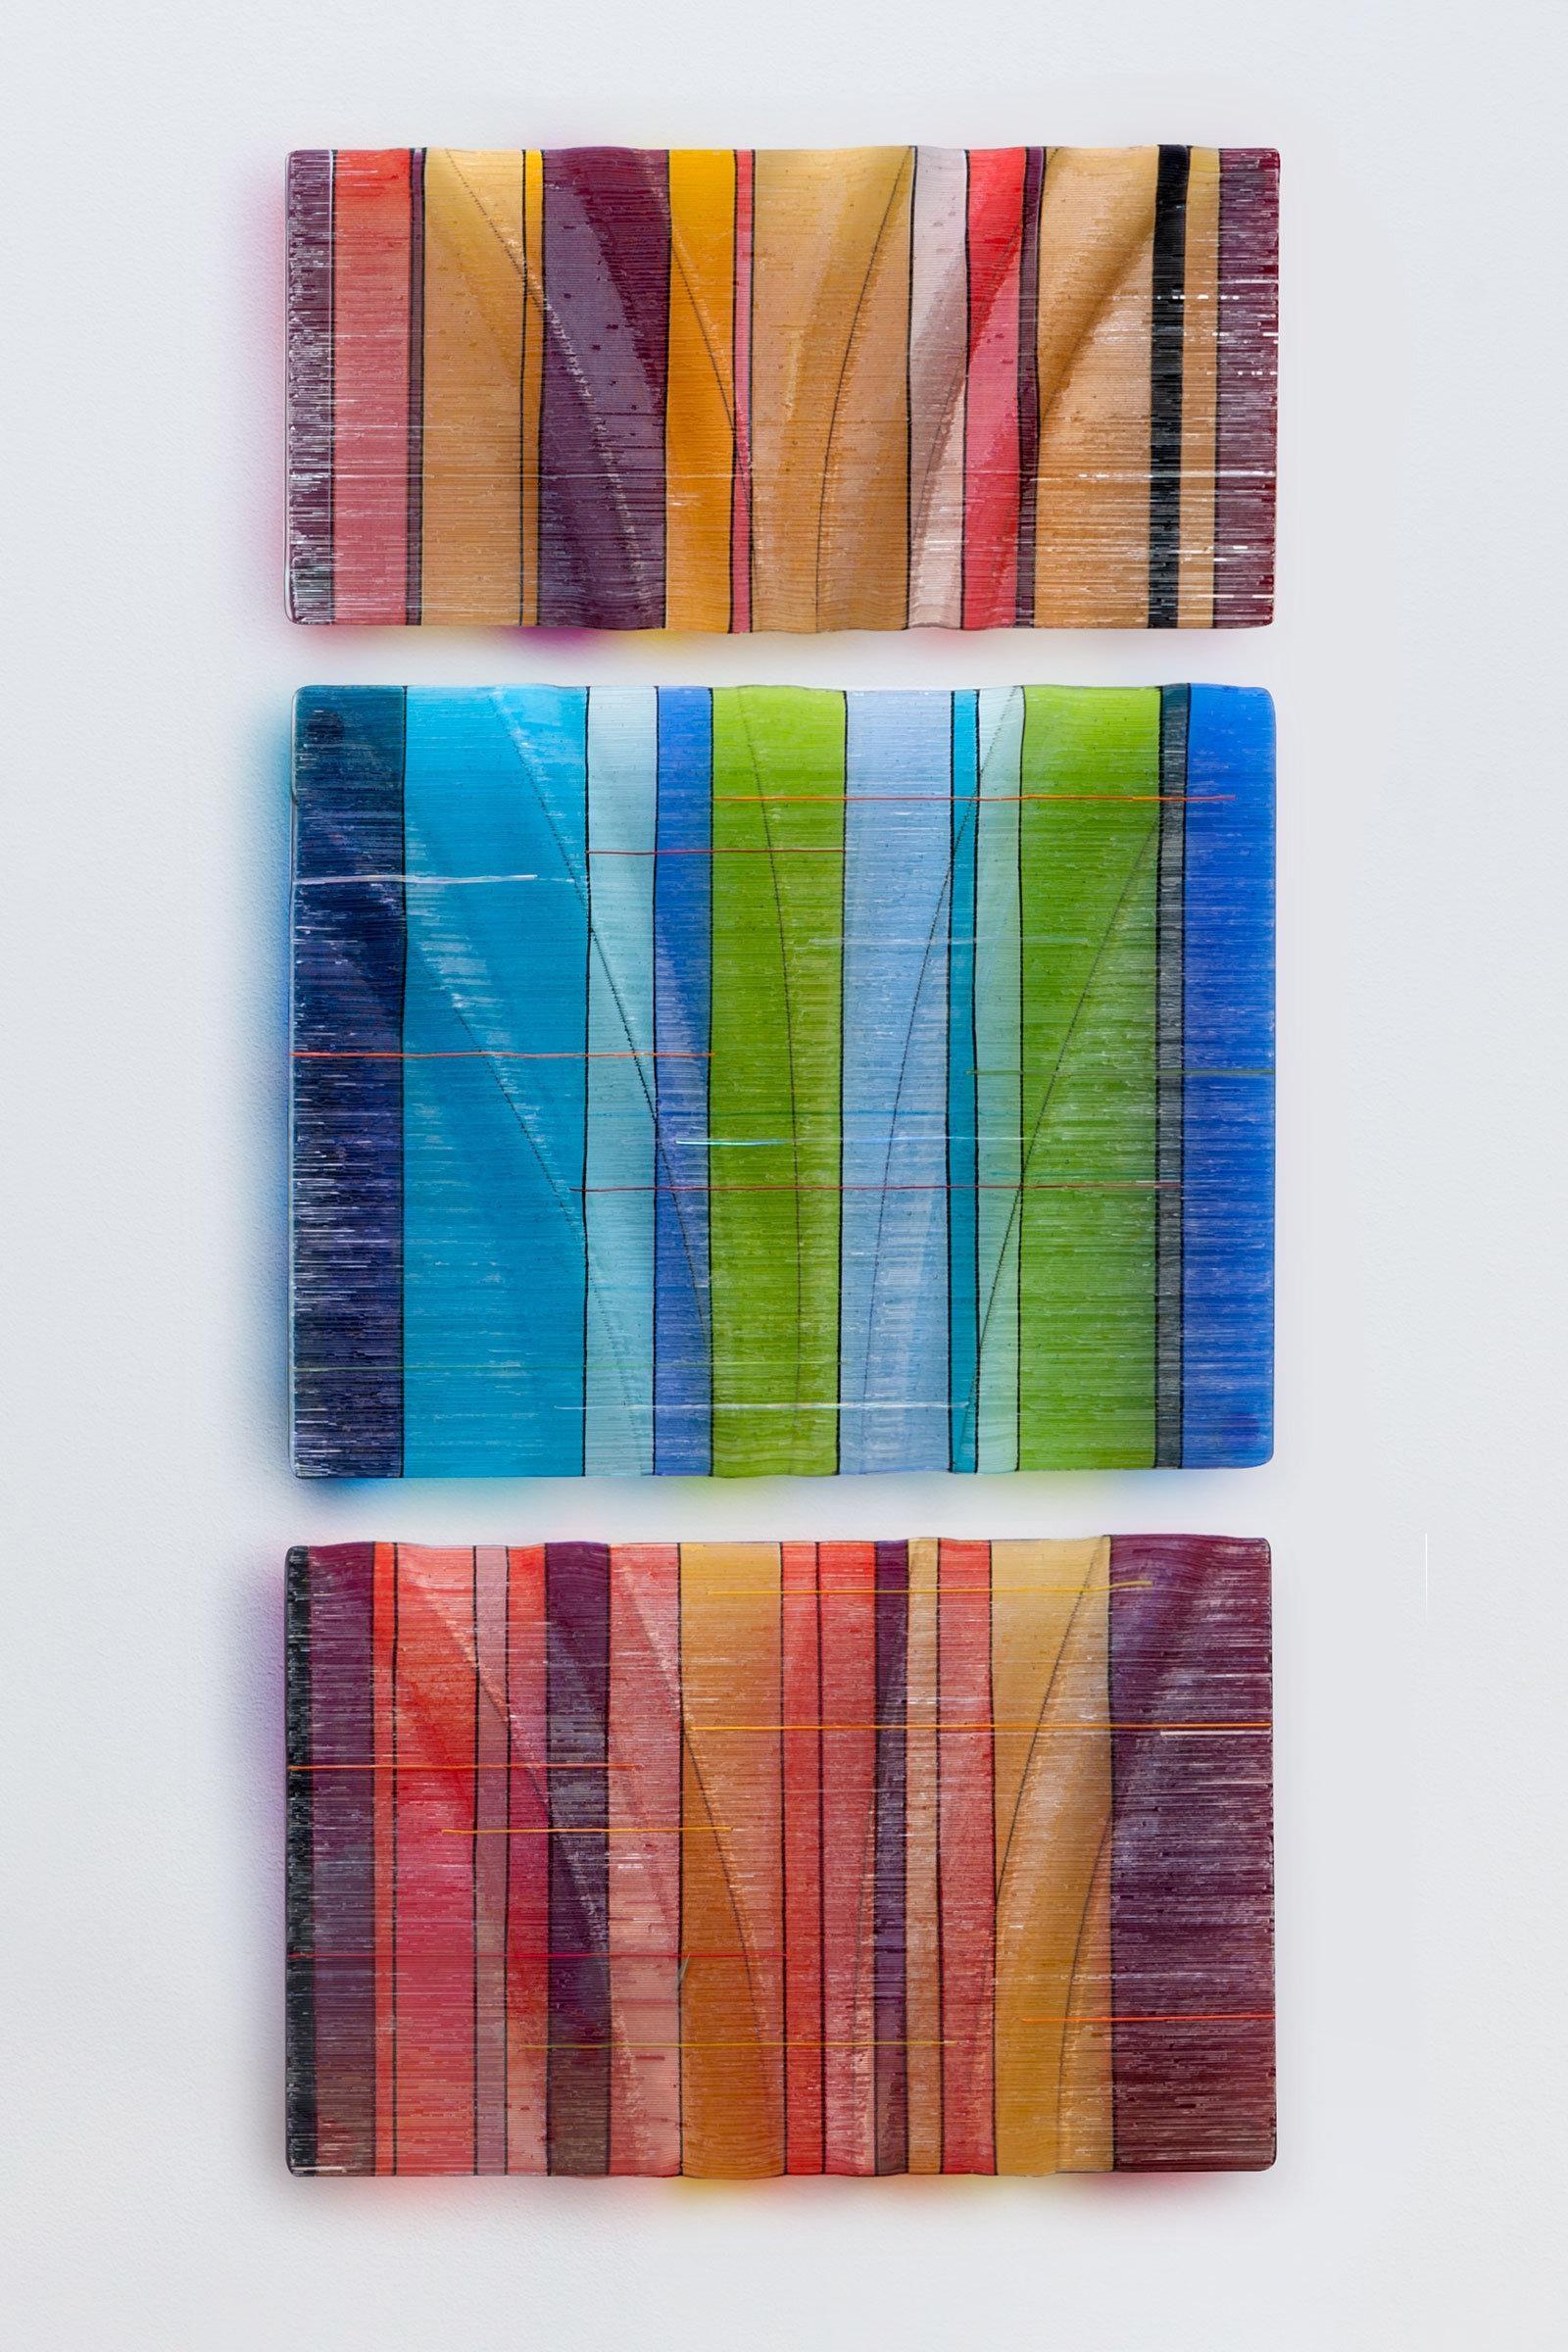 Artisanal Chocolates | Artful Home Regarding Fused Glass Wall Art (View 7 of 20)